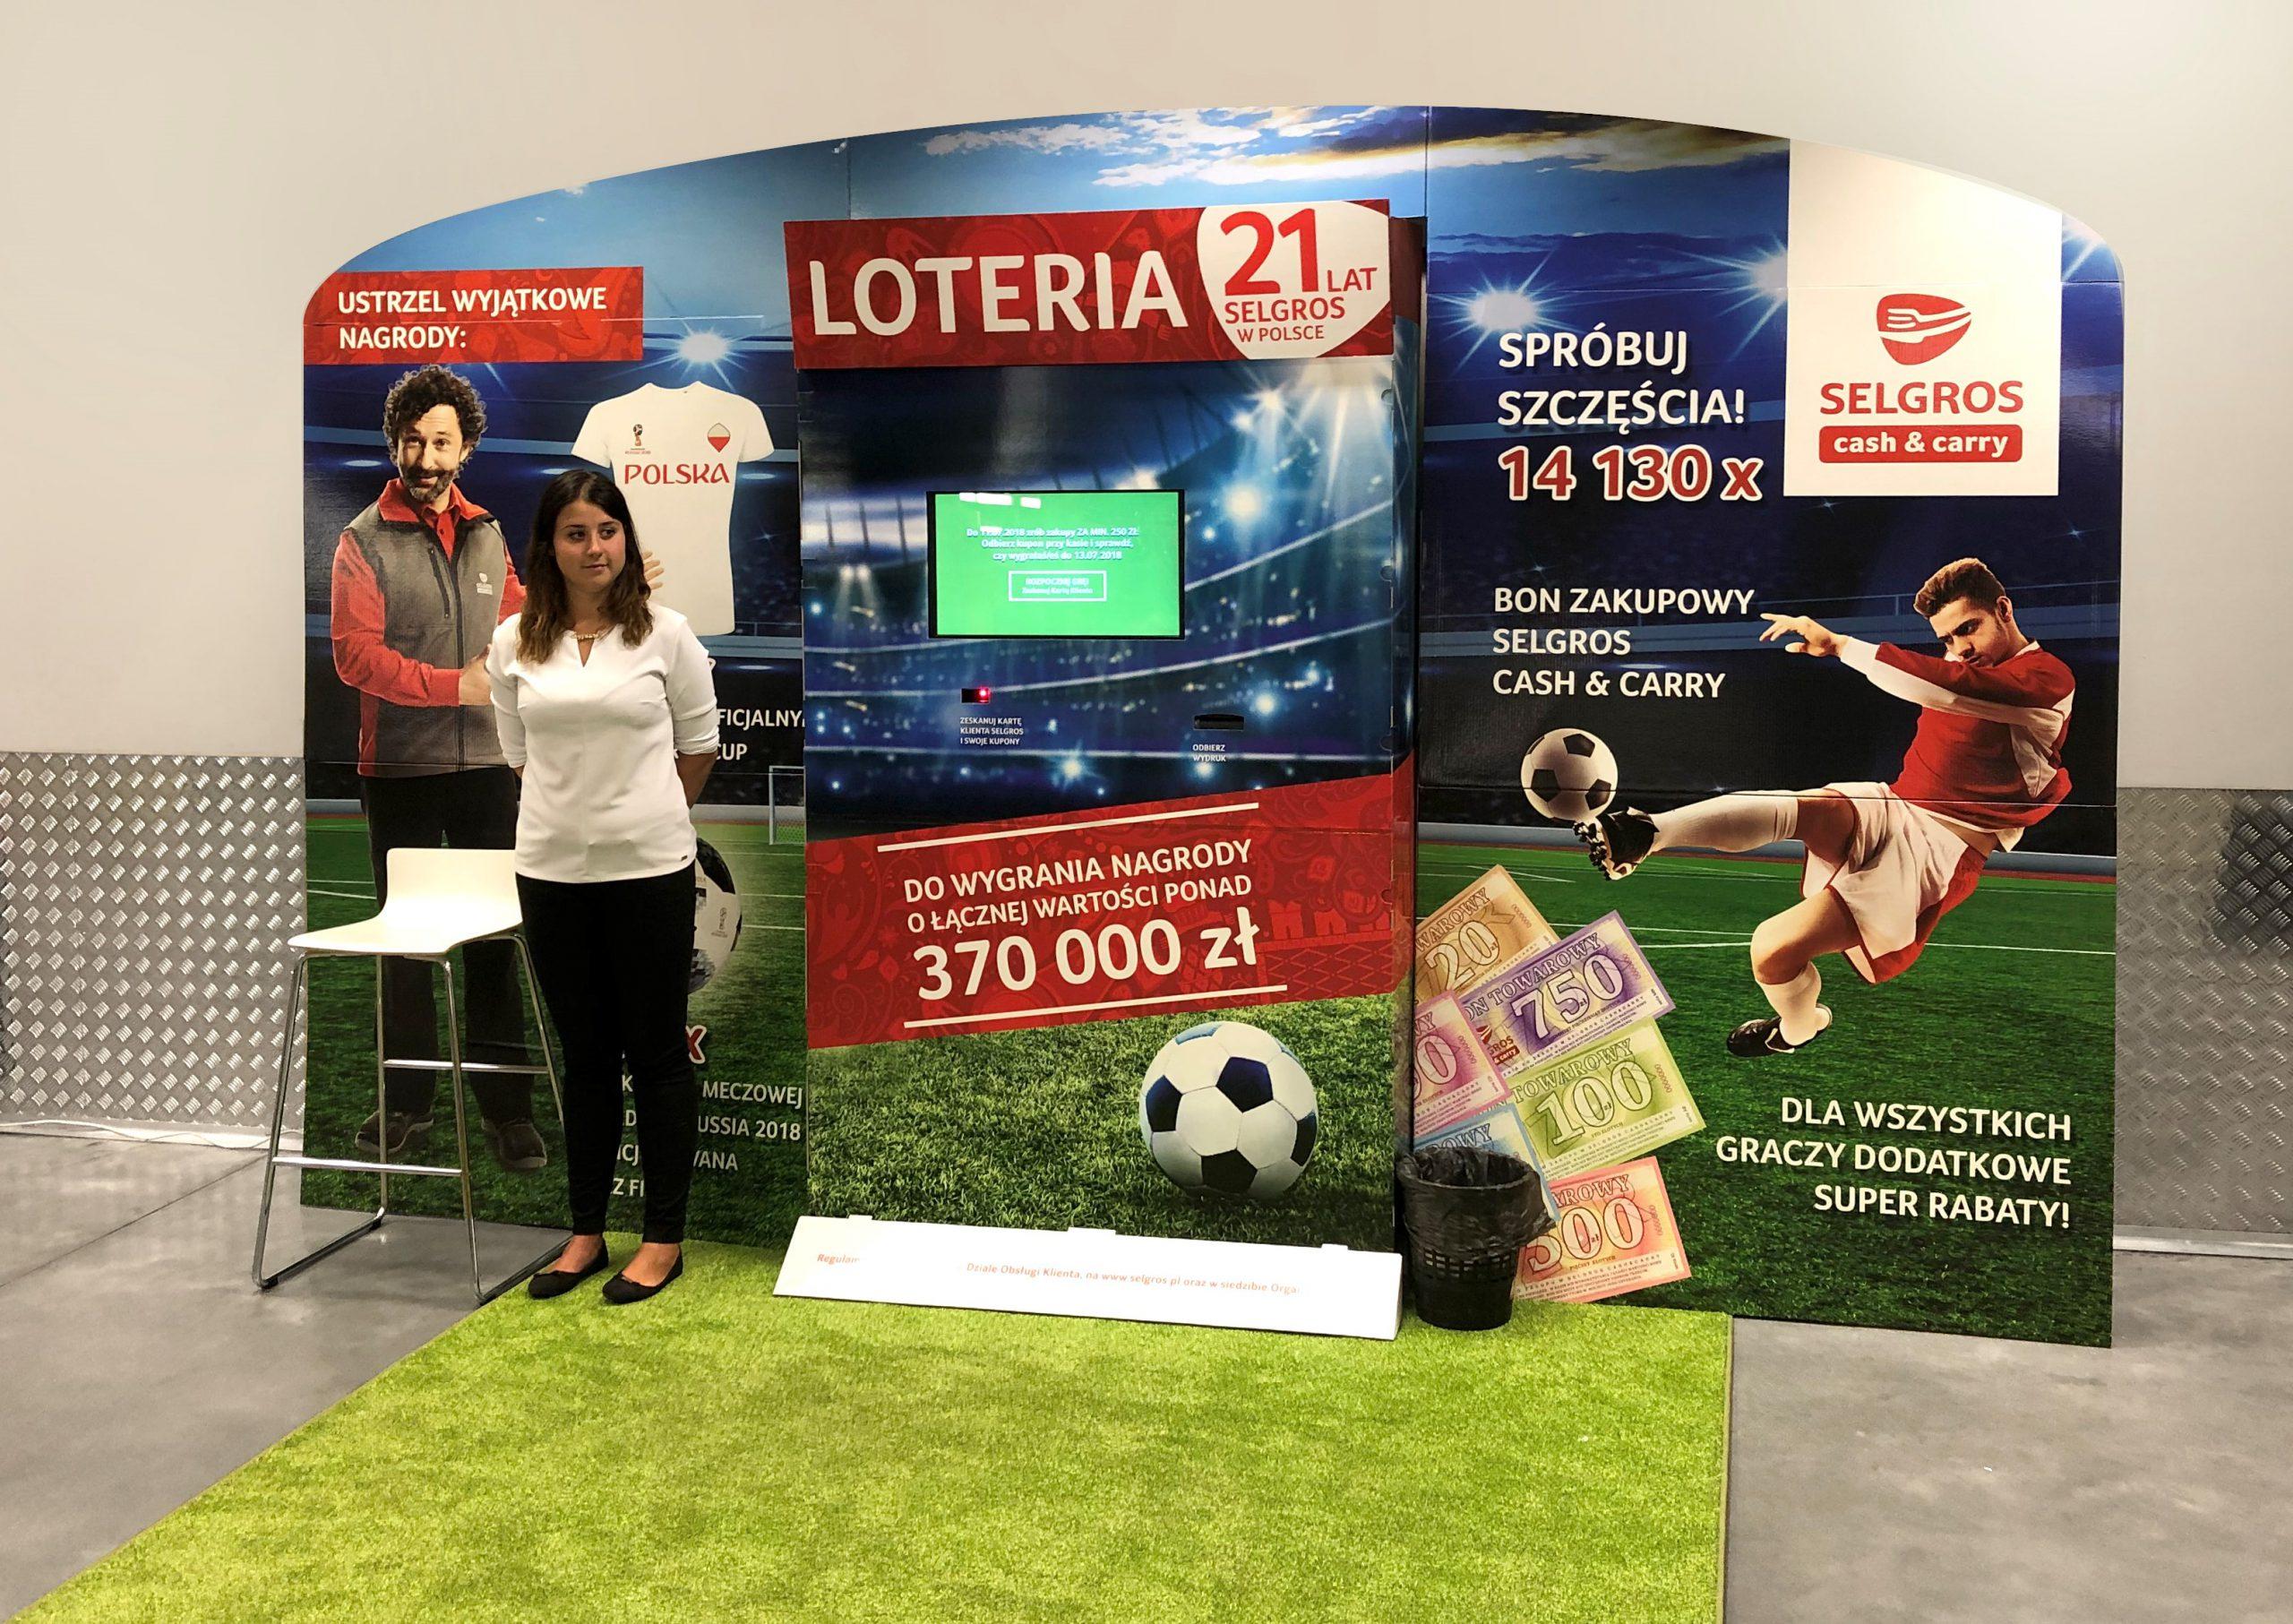 Wielka loteria jubileuszowa w Selgros Cash&Carry